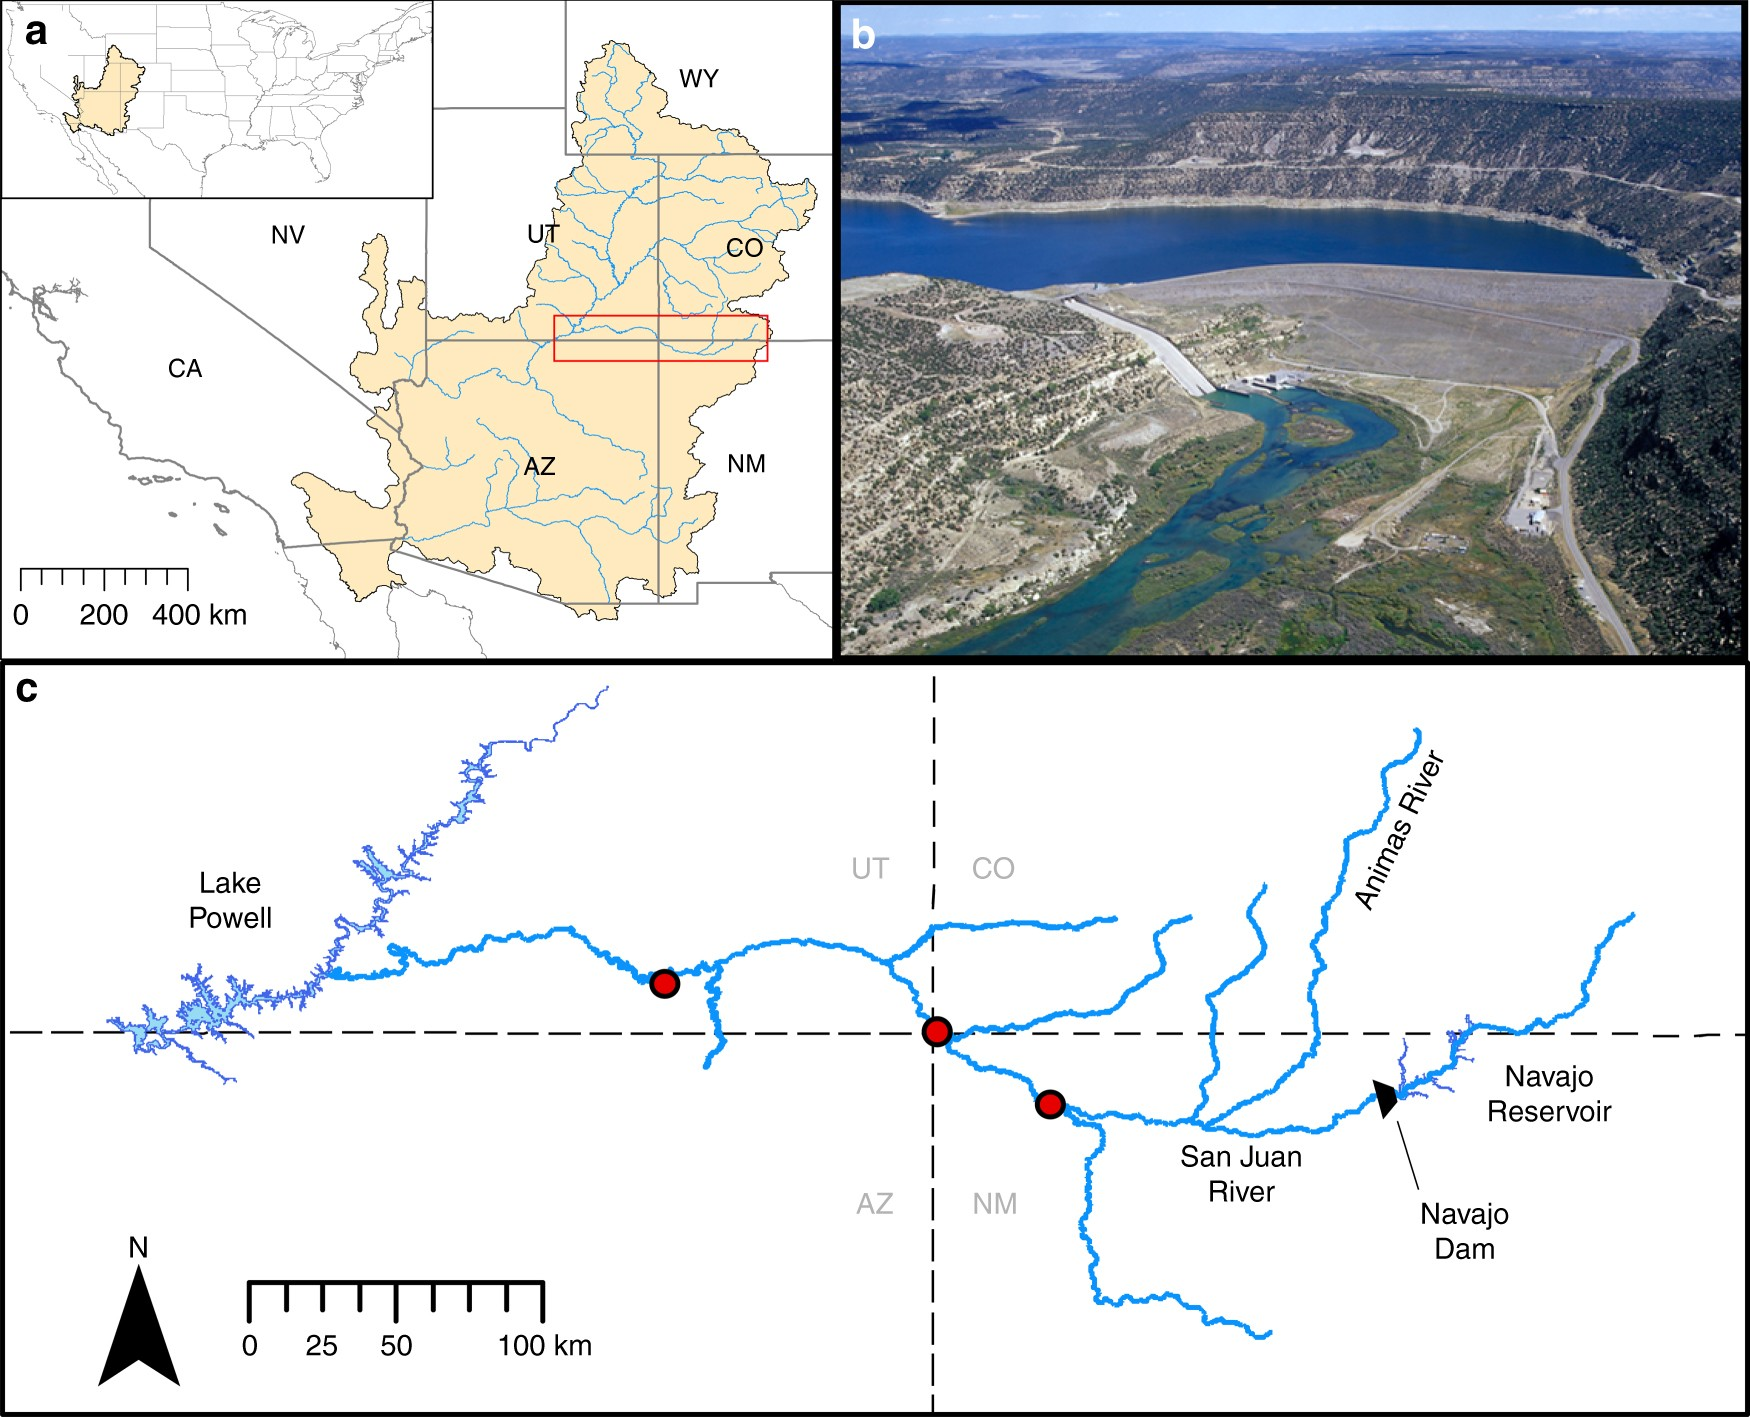 Designing flows to resolve human and environmental water